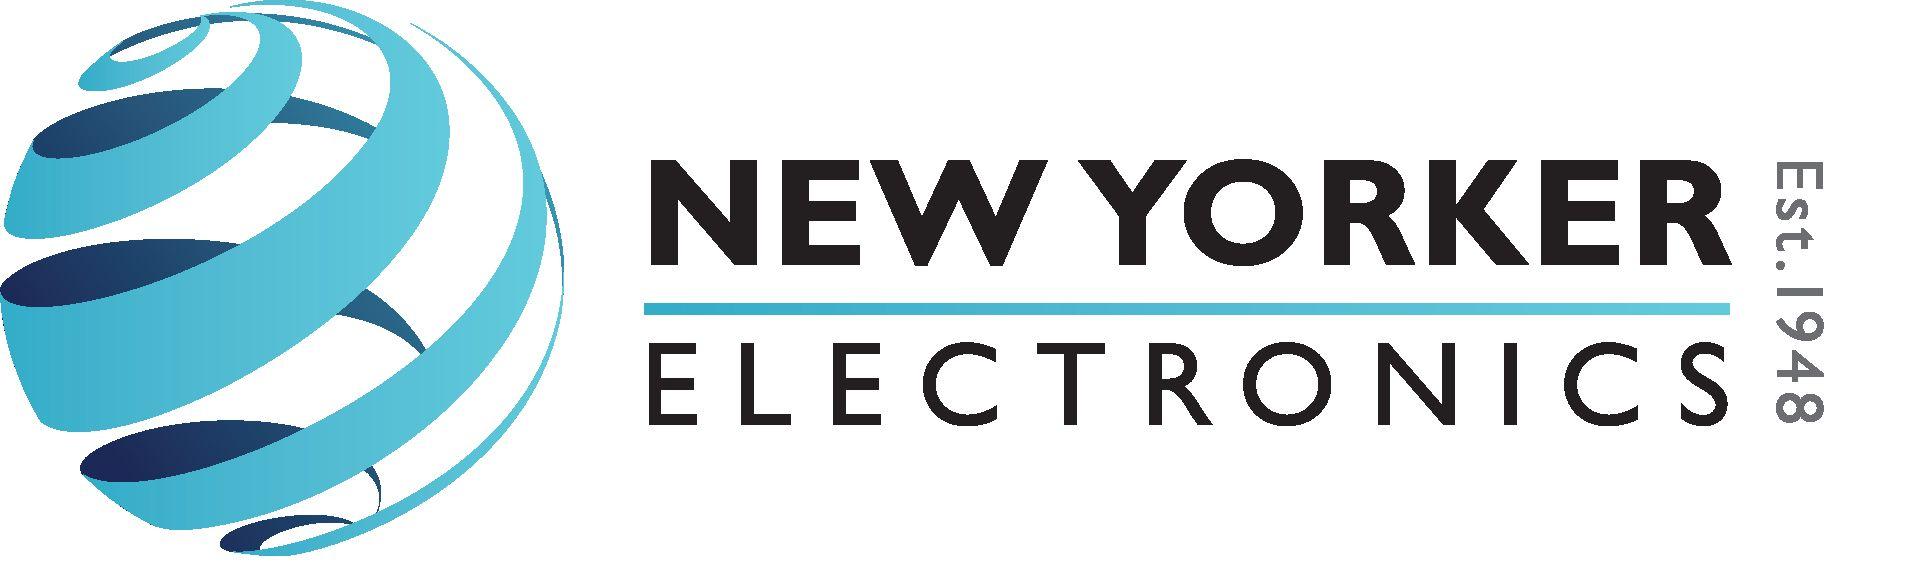 New Yorker Electronics